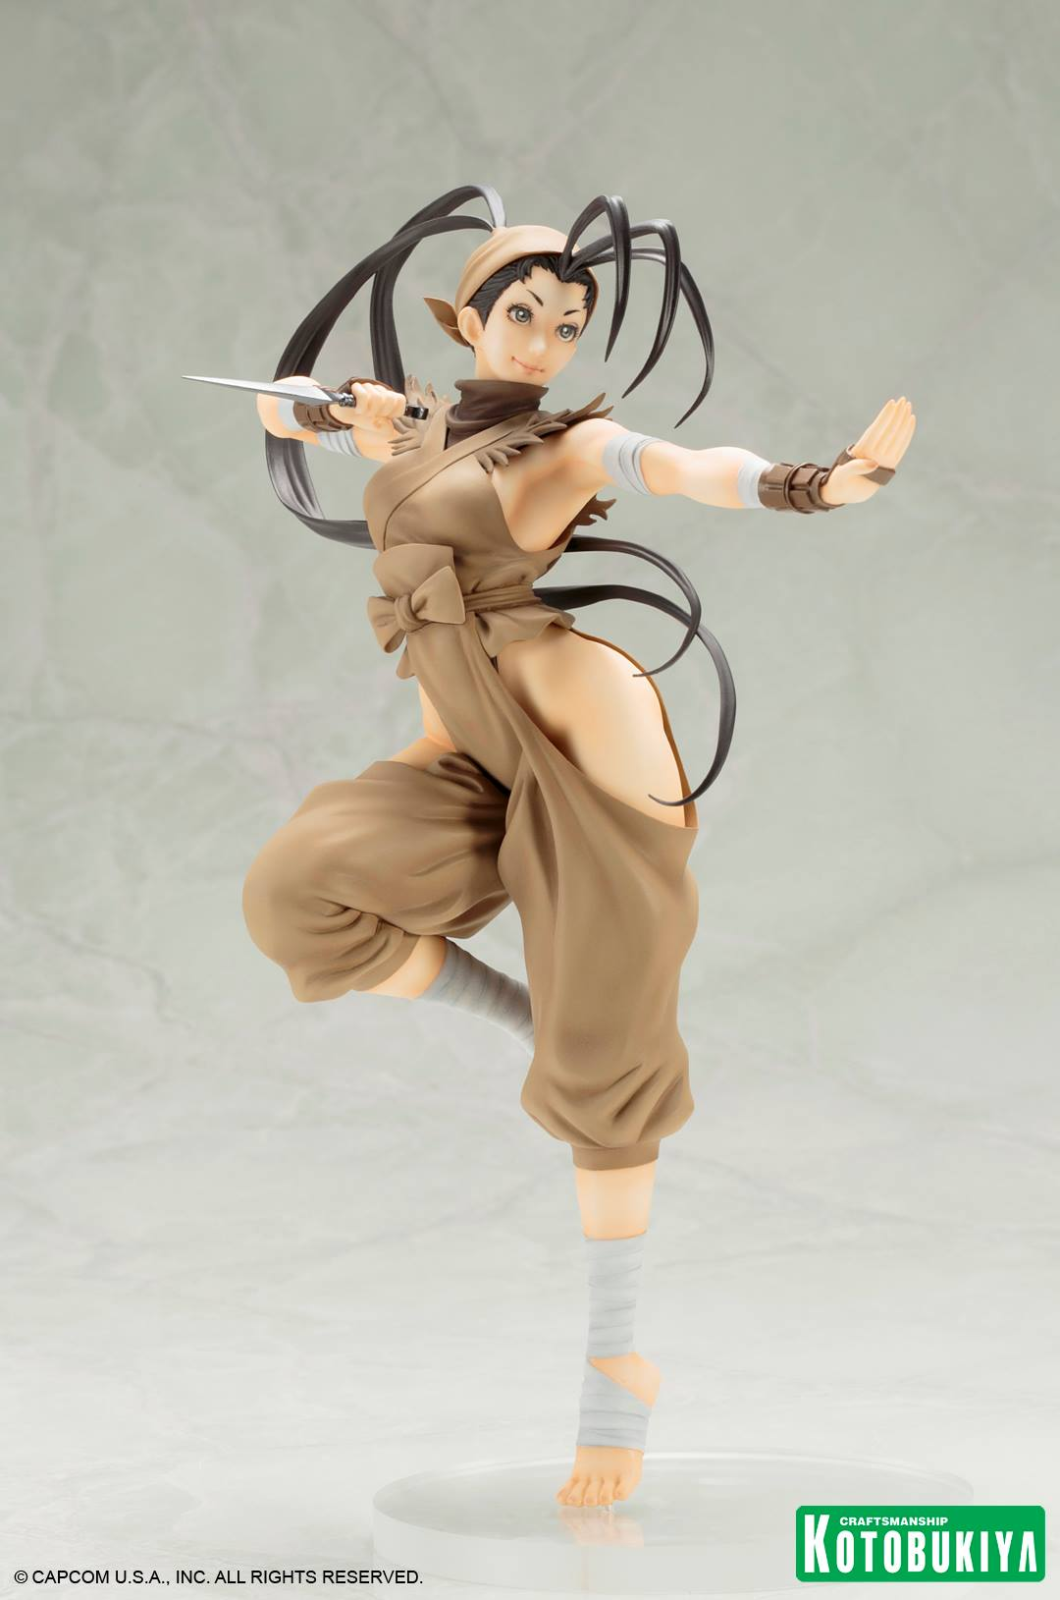 KOTOBUKIYA BISHOUJO Street Fighter Ibuki figure statue échelle 1 7 SV158